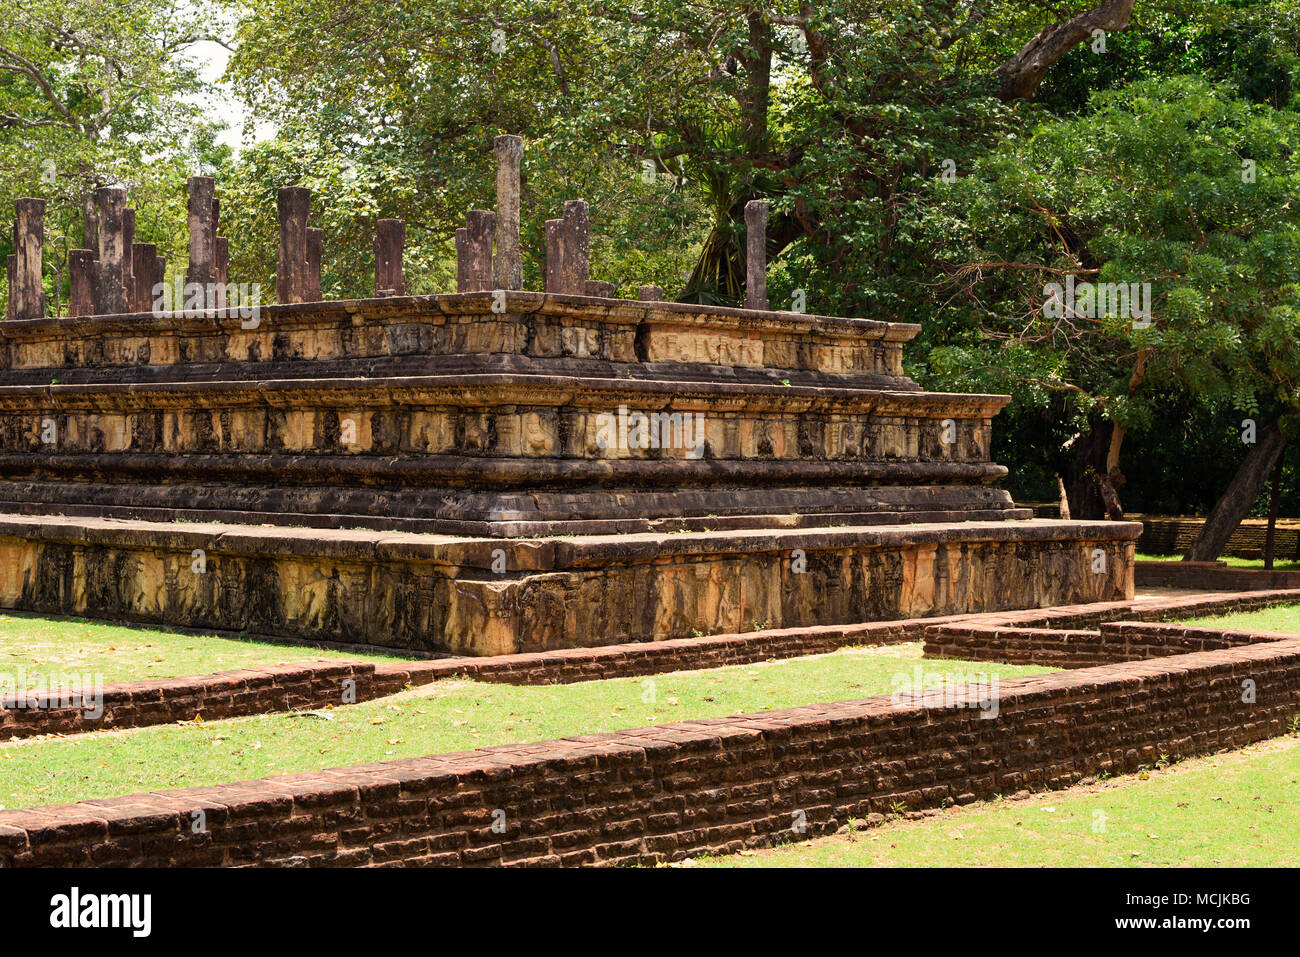 Ruinas del Palacio Real, Auditorio, Polonnaruwa, la Provincia Central del Norte, Sri Lanka Imagen De Stock